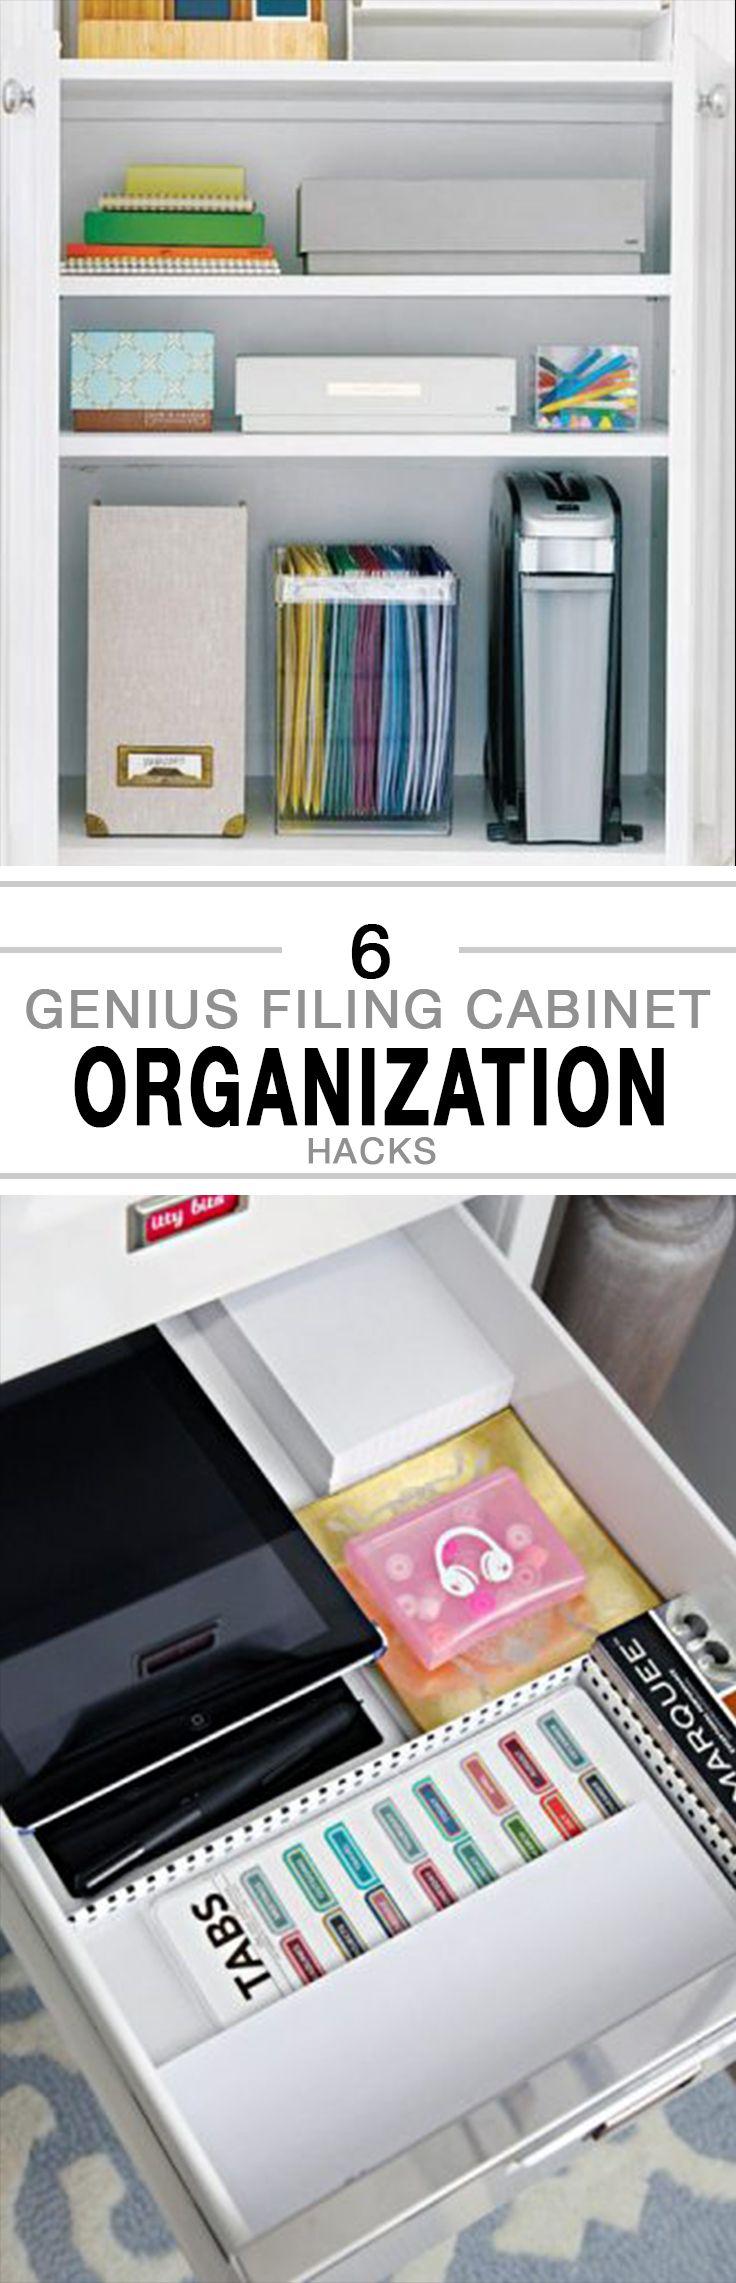 Filing organization hacks, organization hacks